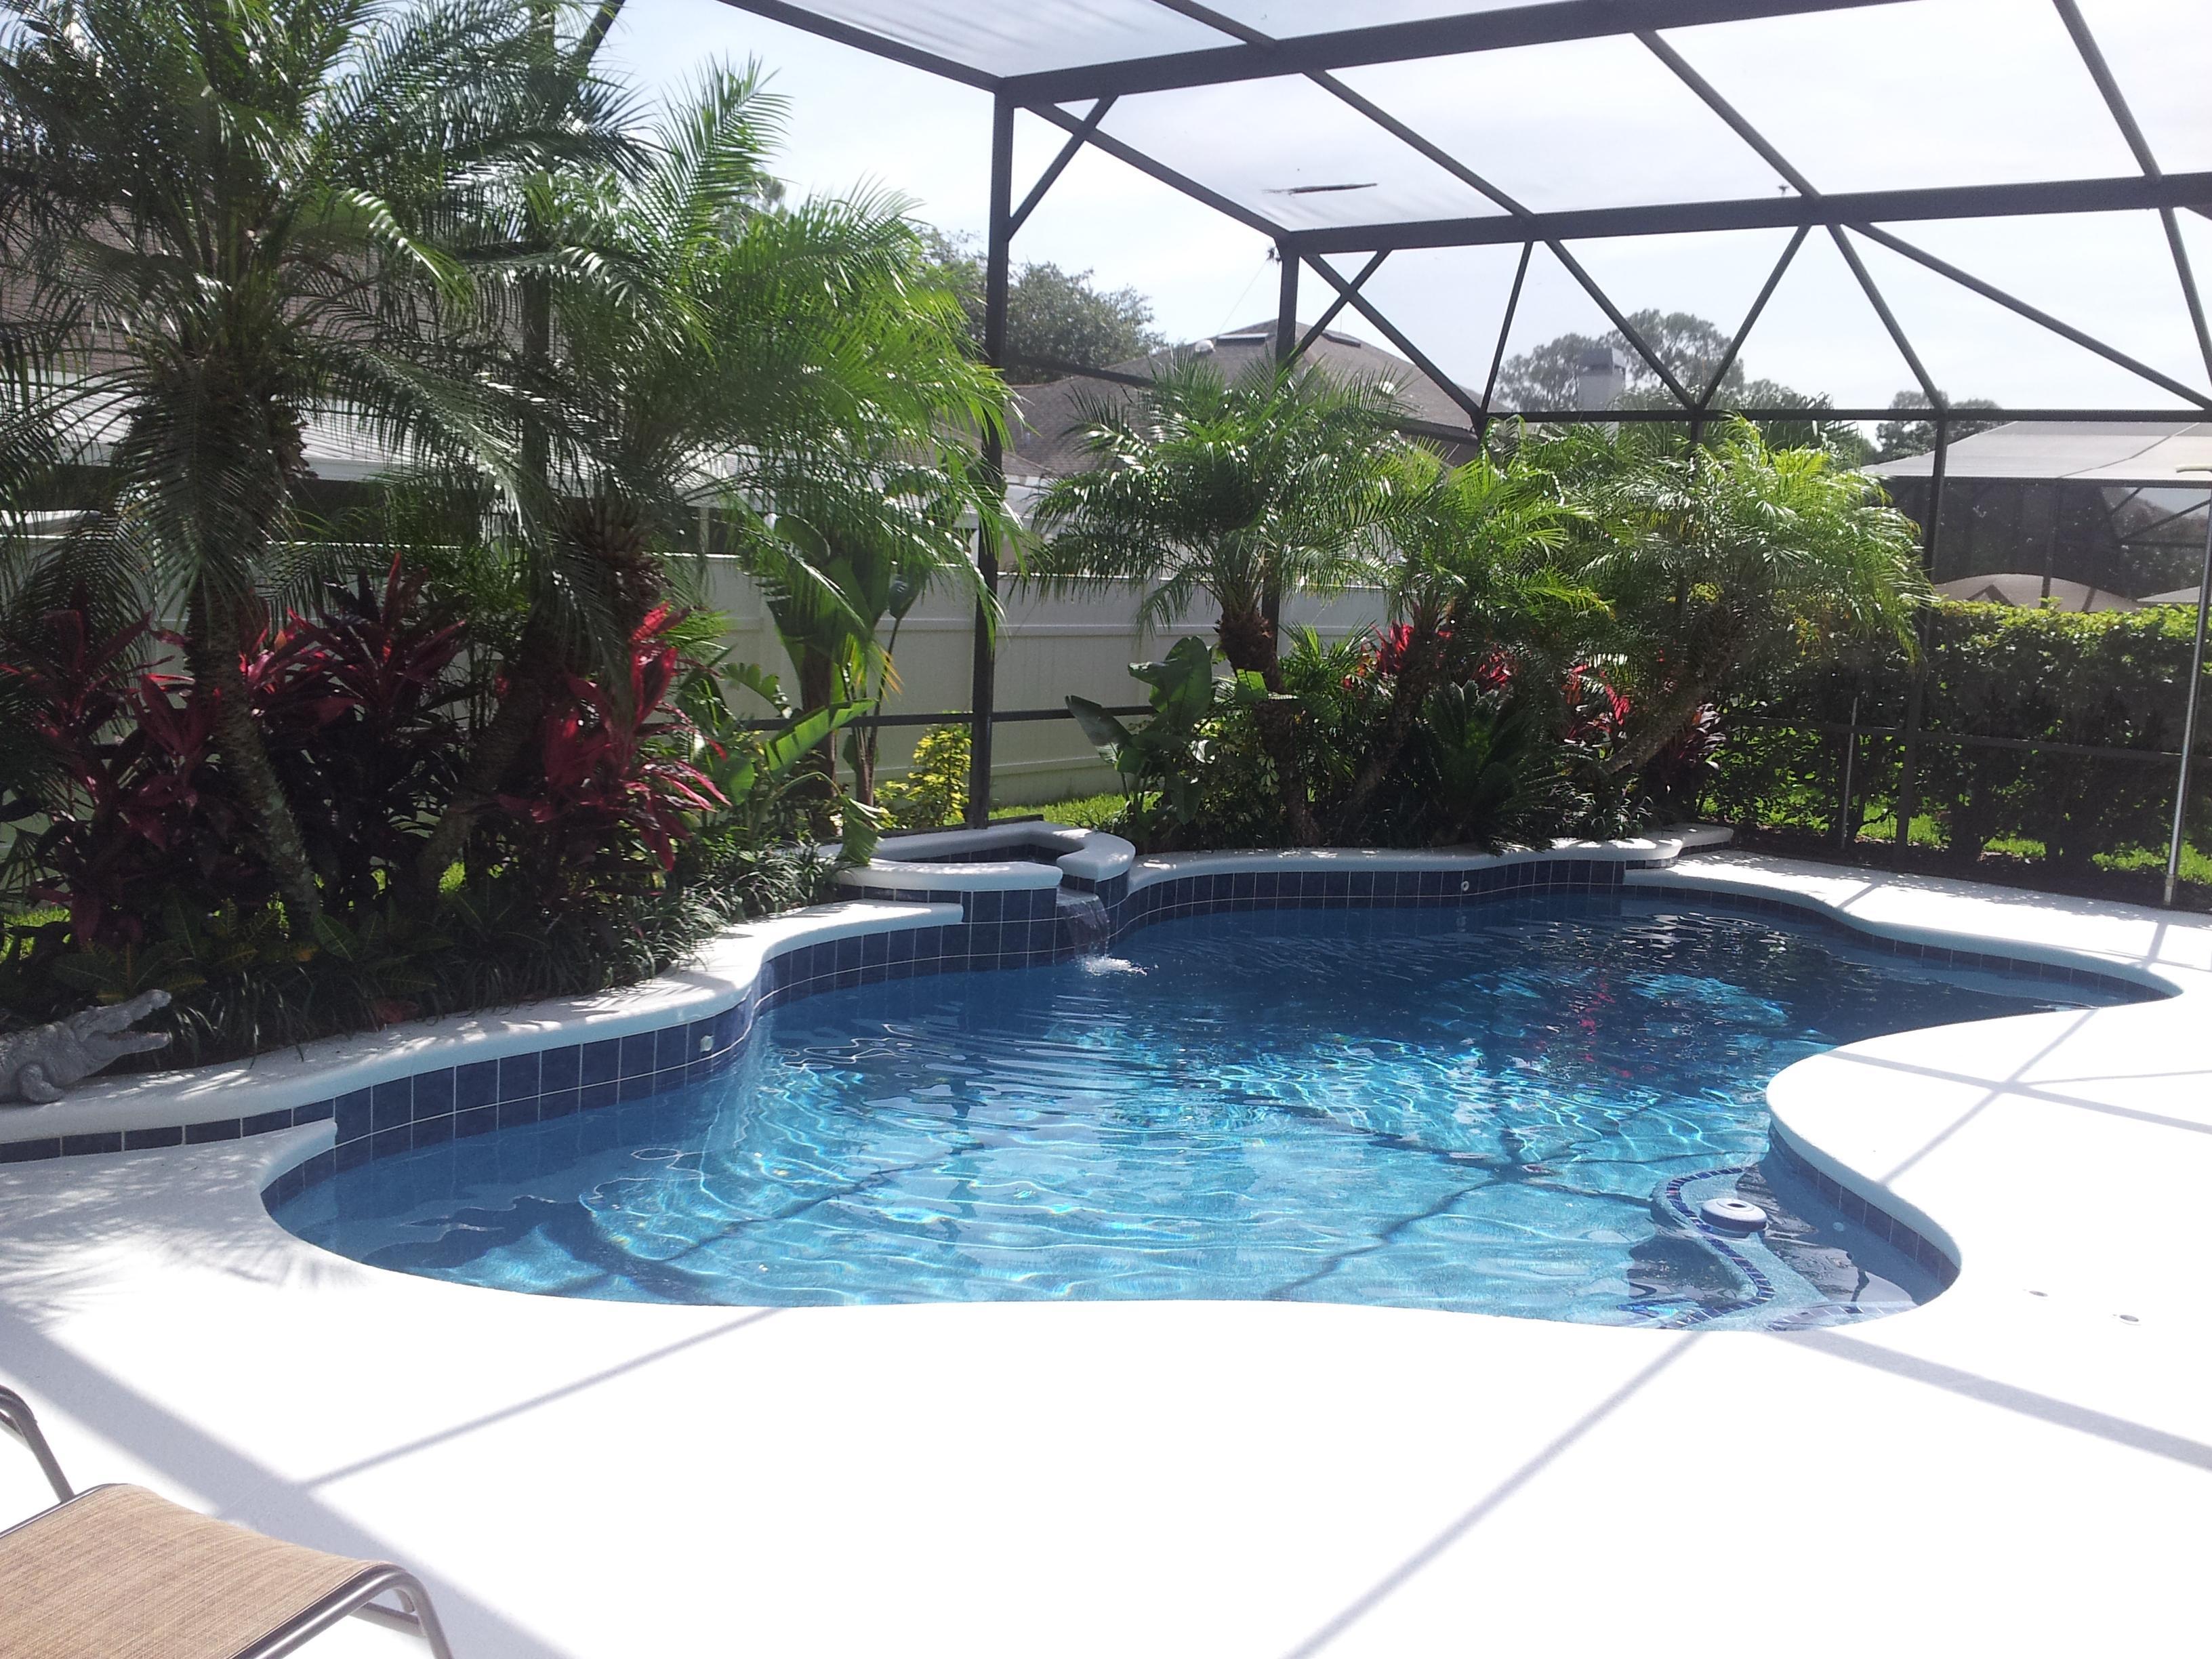 Ibiza pool llc in davenport fl swimming pool for Pool dealers